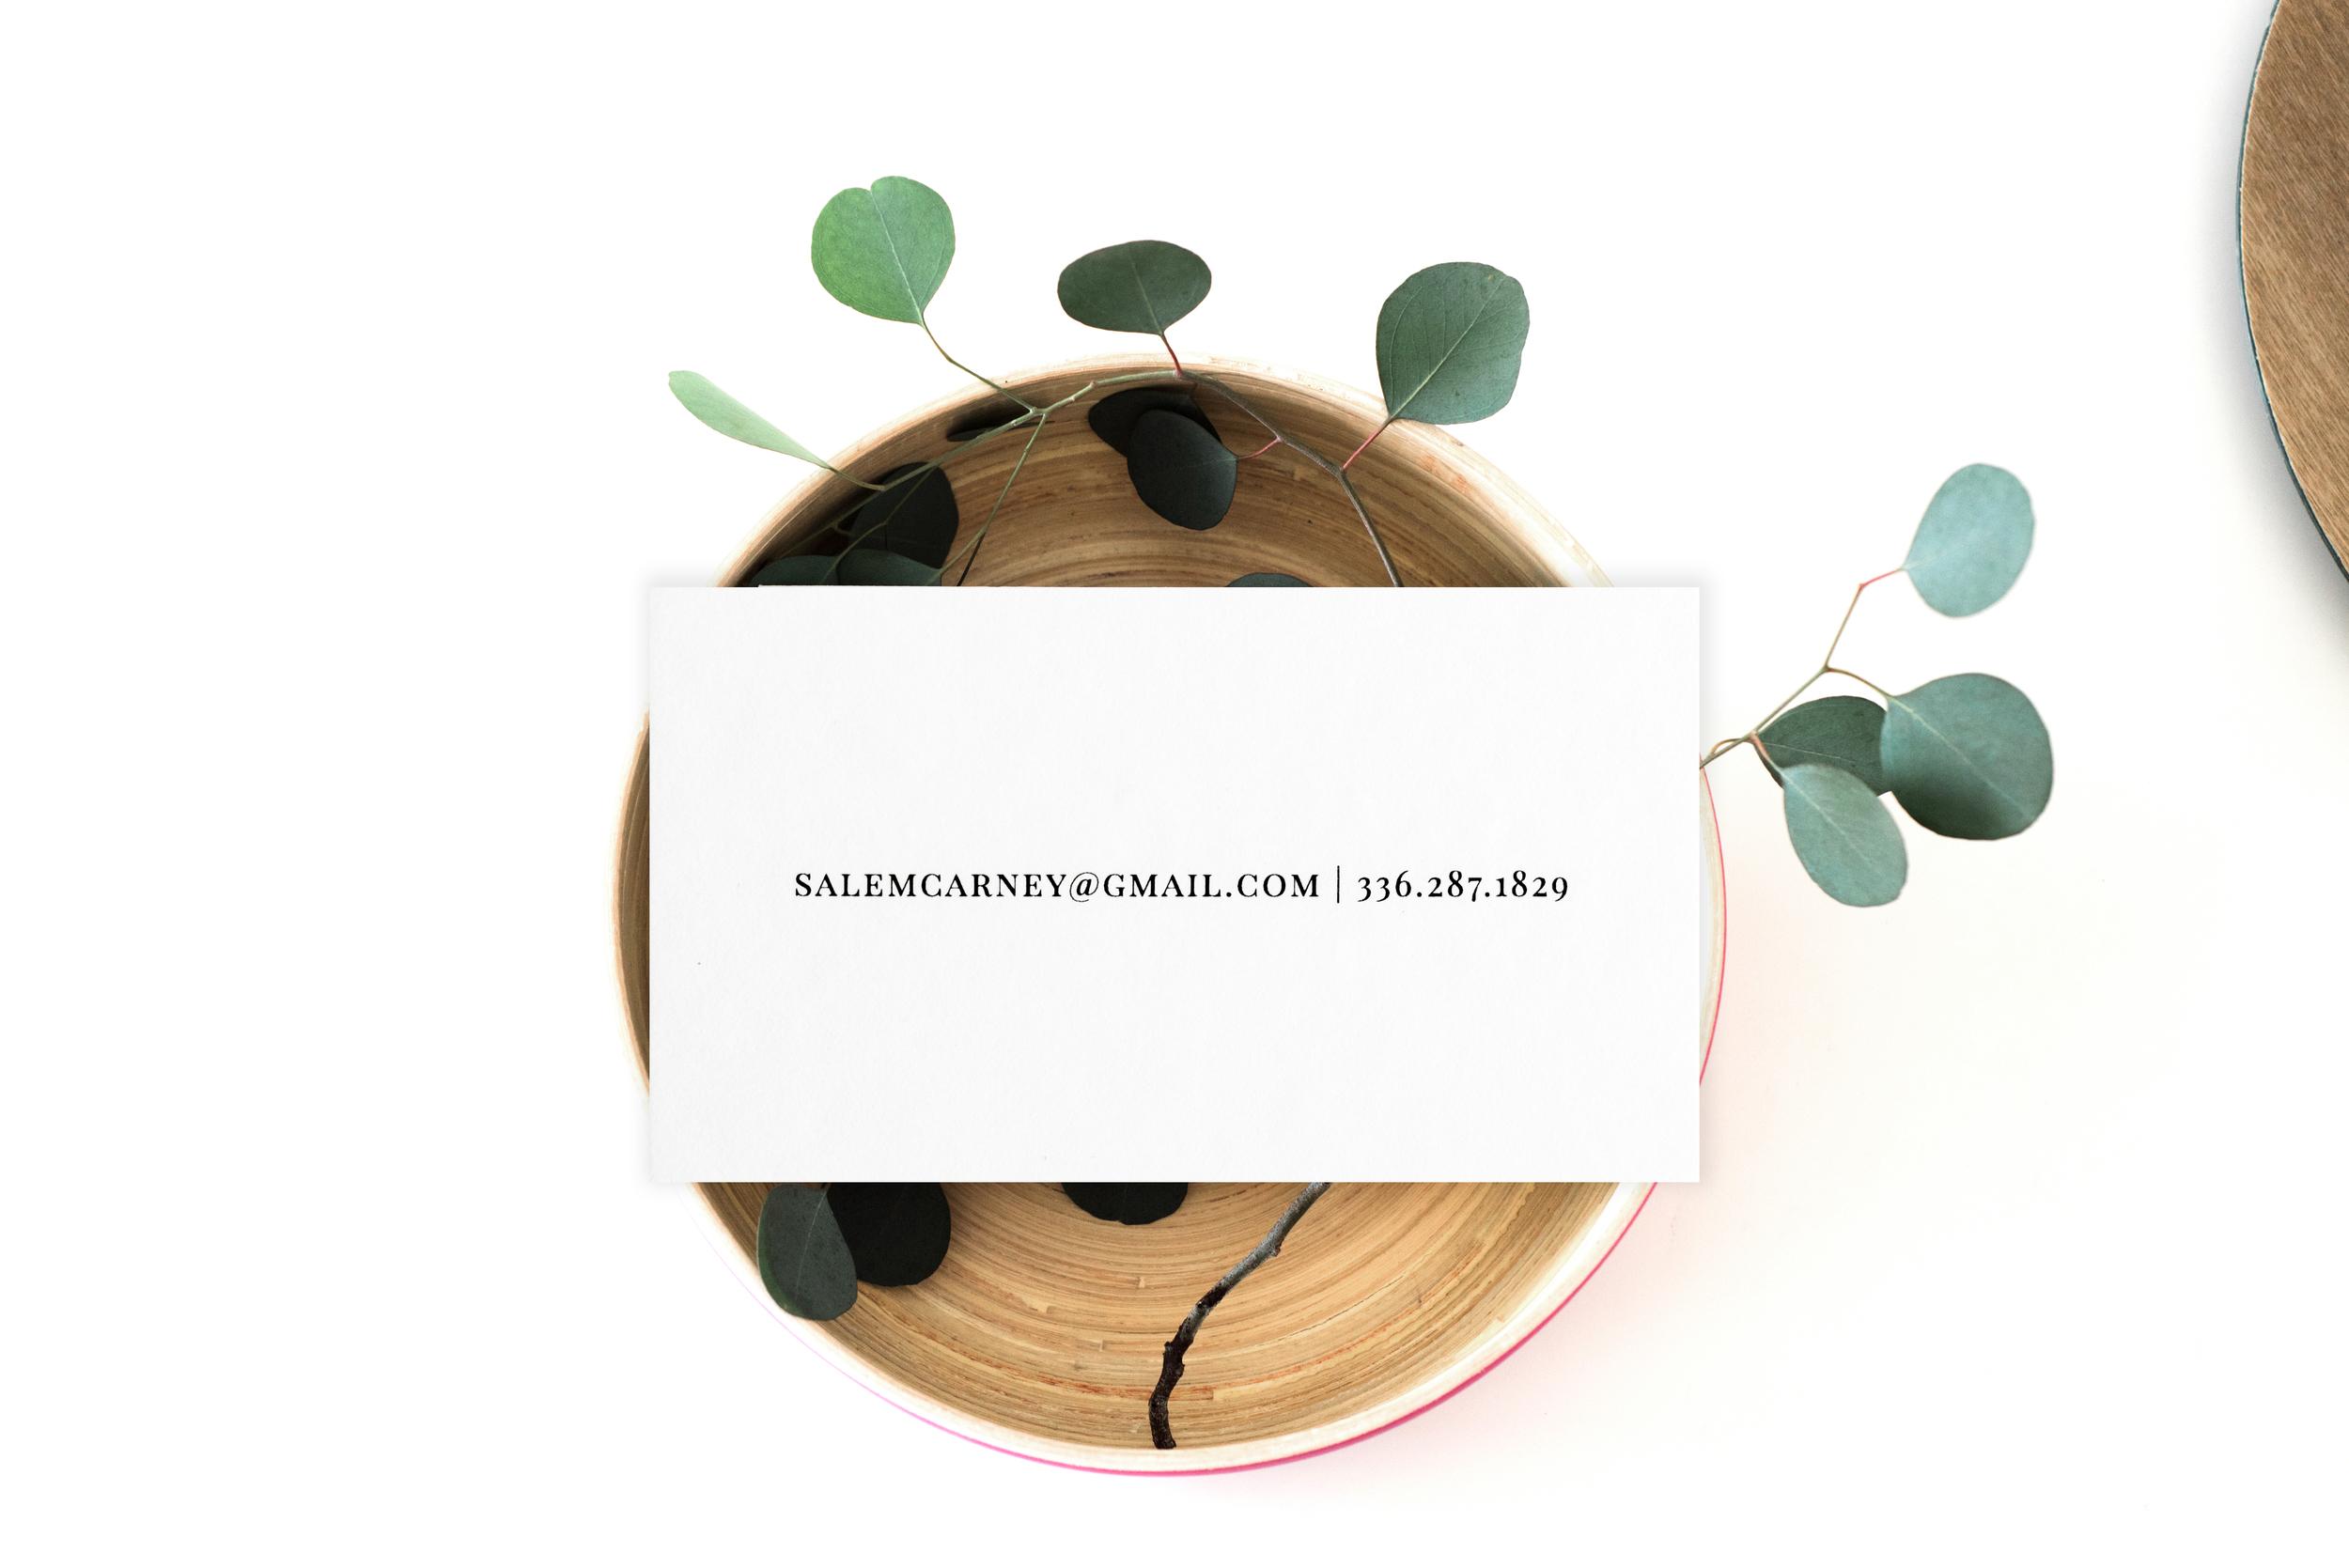 SalemBusinessCard-3.jpg